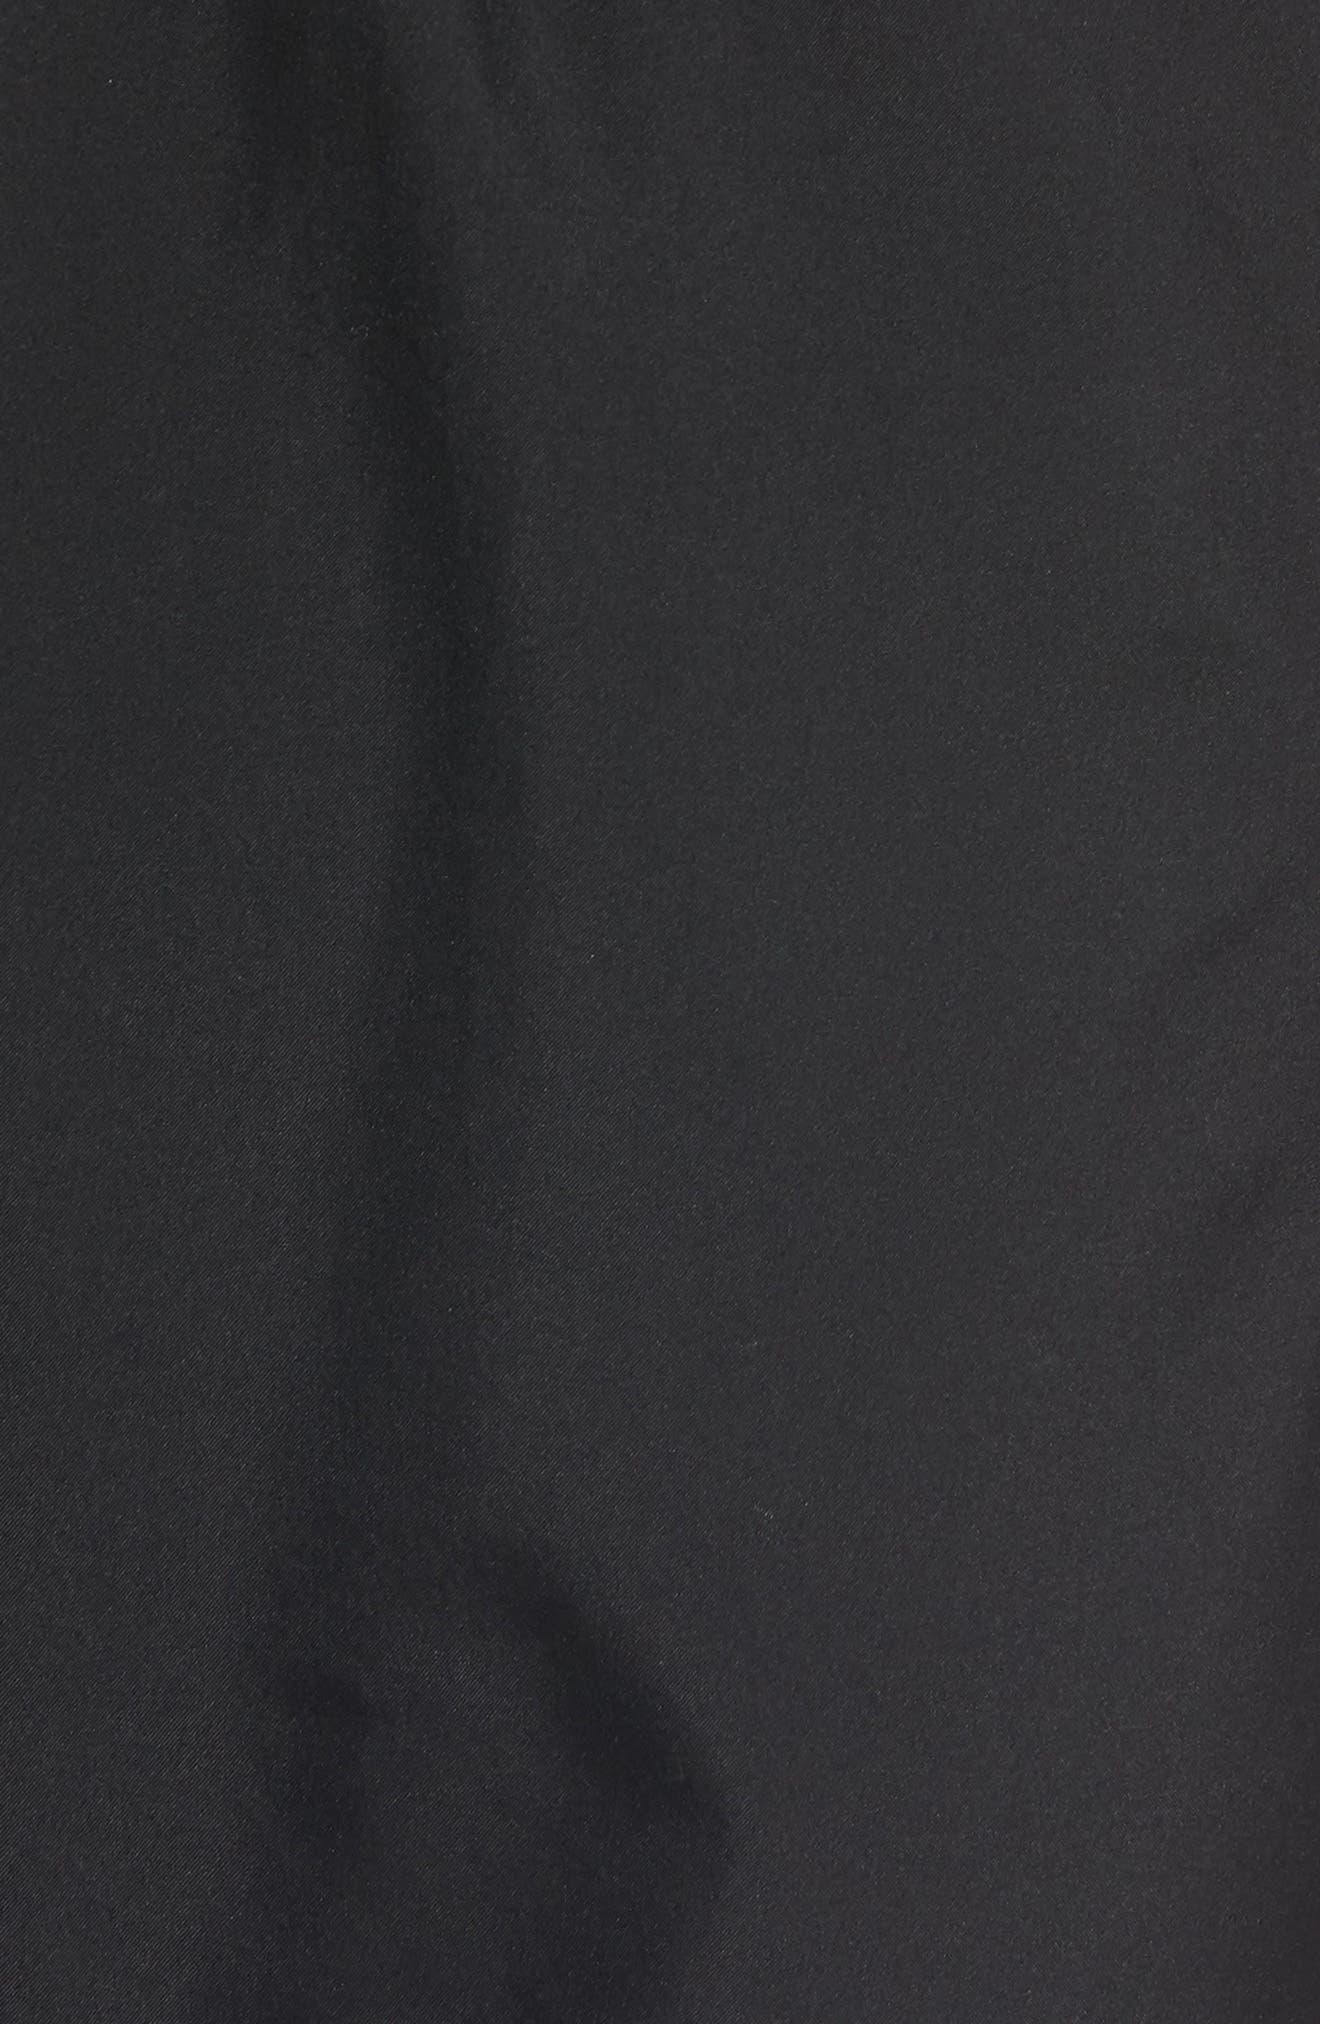 Slim Fit Sweatpants,                             Alternate thumbnail 5, color,                             Black